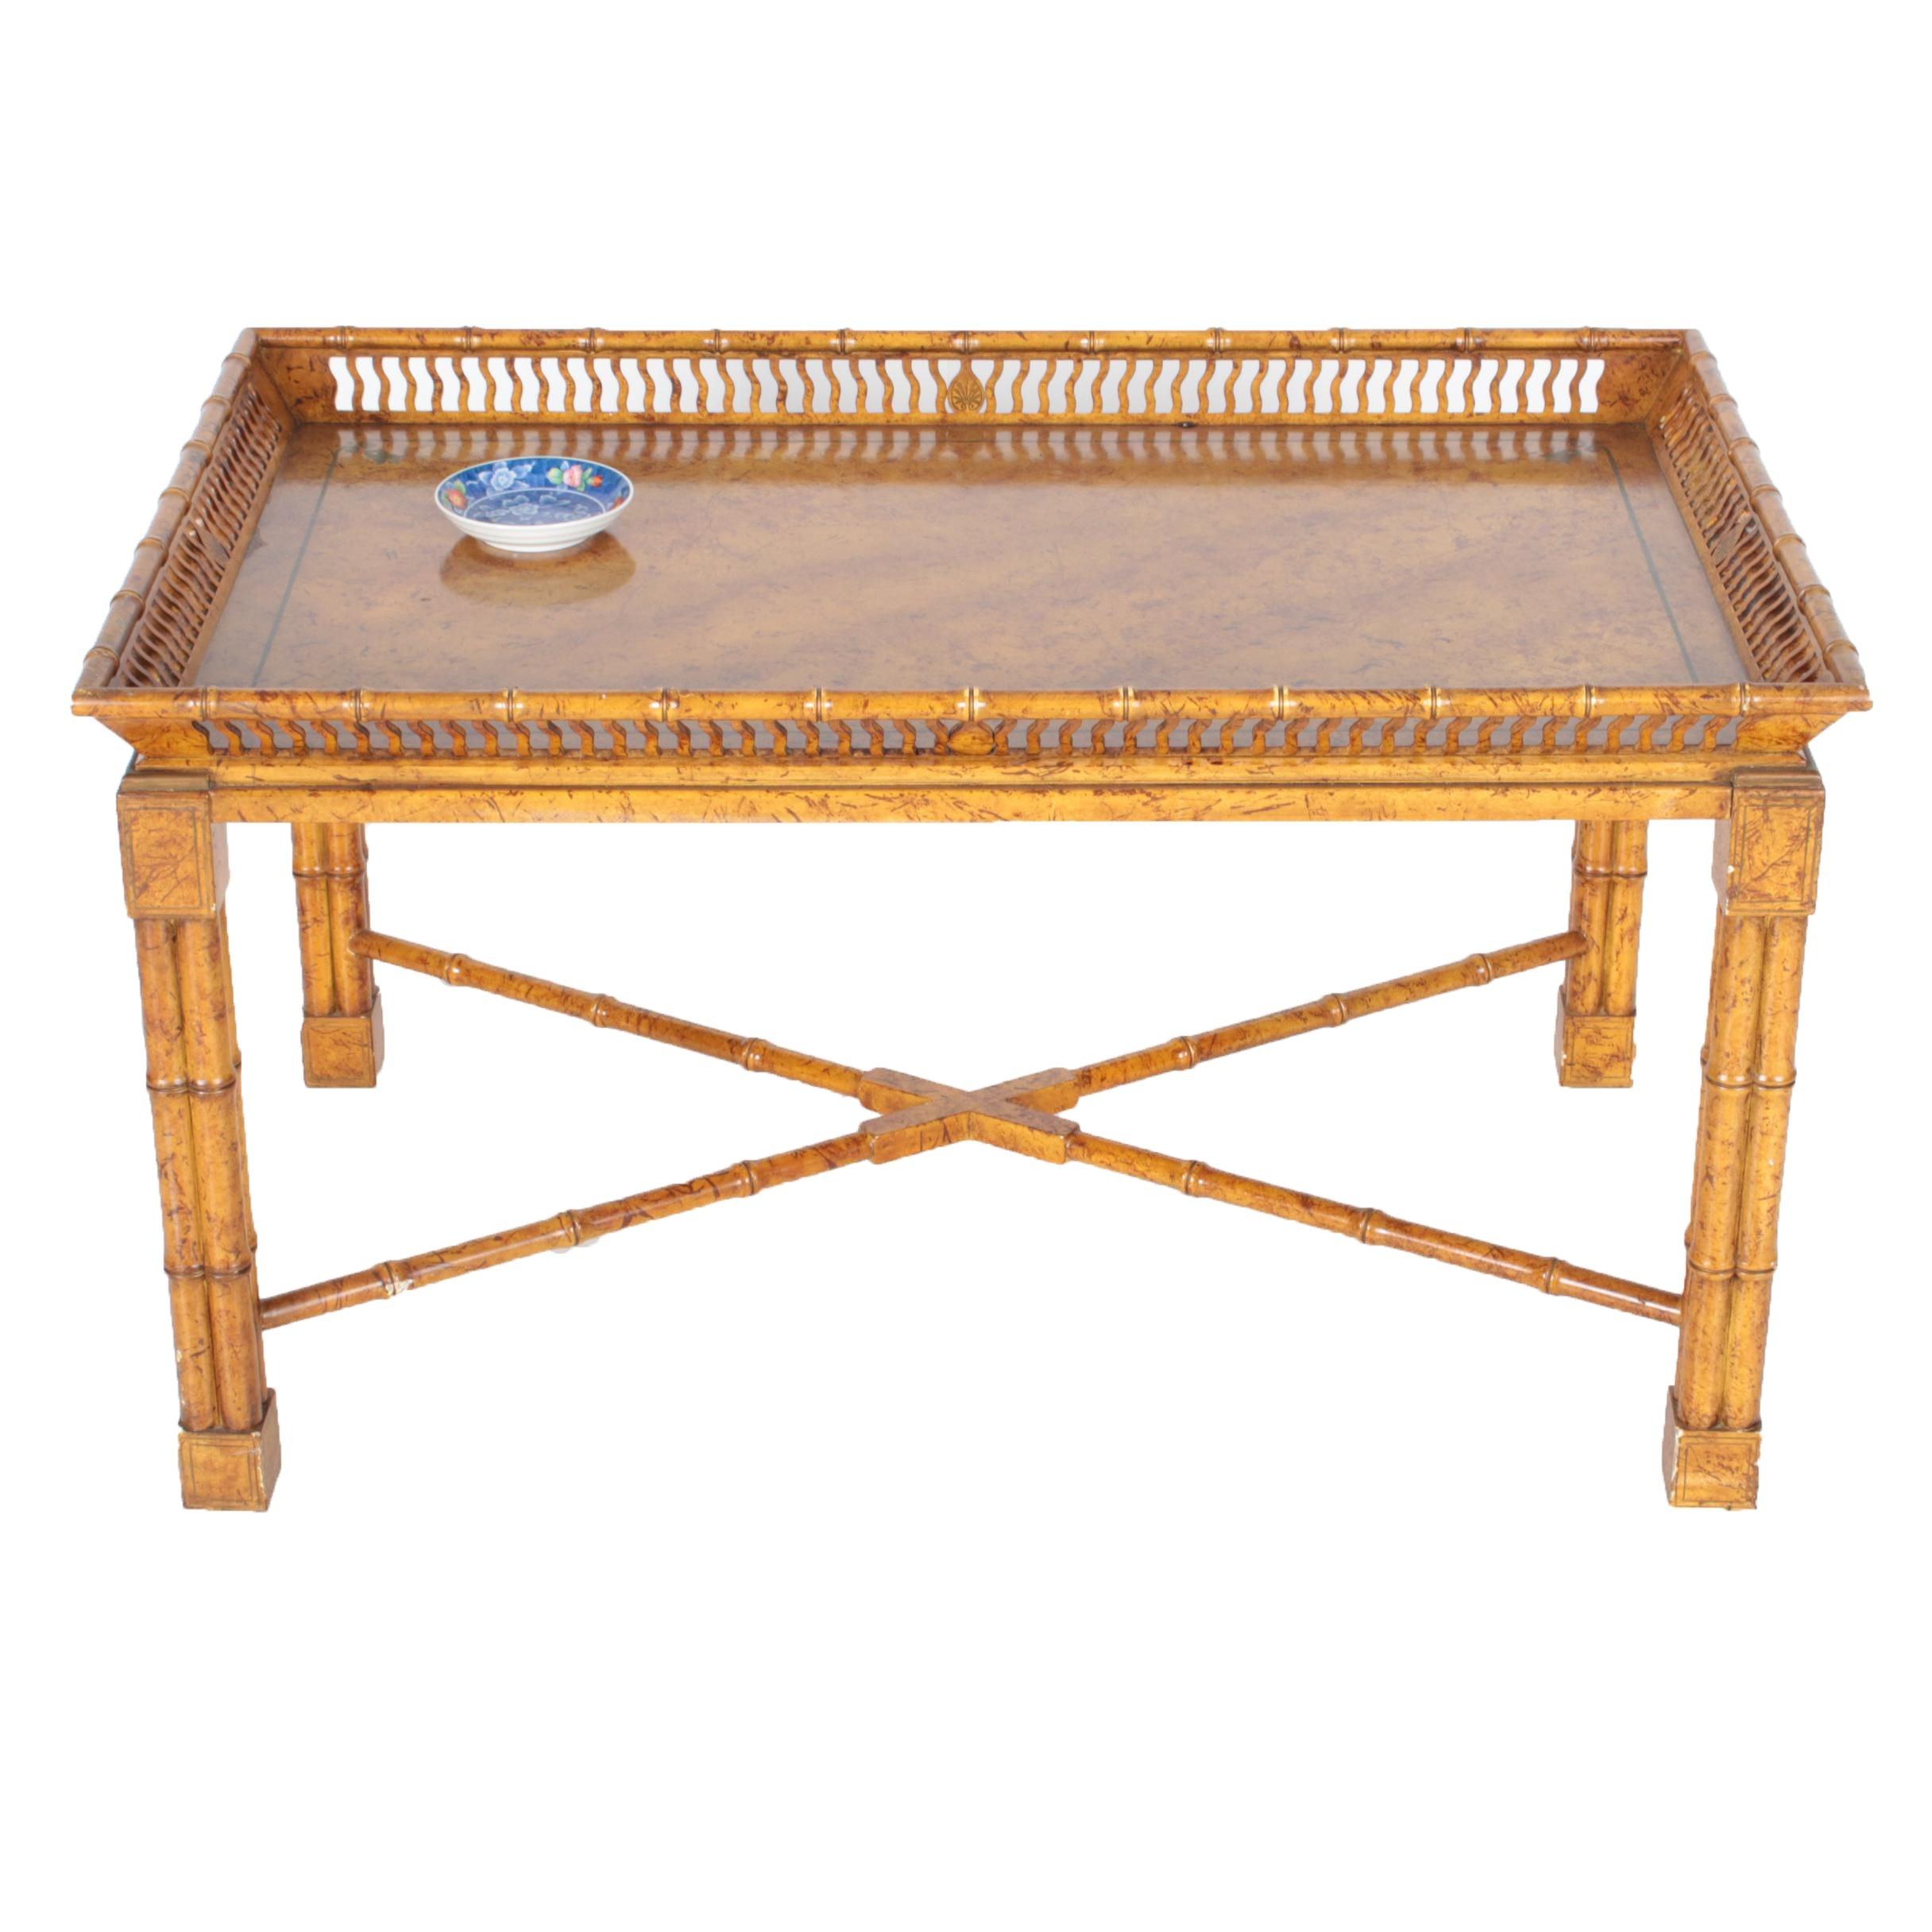 Chinoiserie Faux-Bamboo Coffee Table by Mario Buatta for John Widdicomb Company